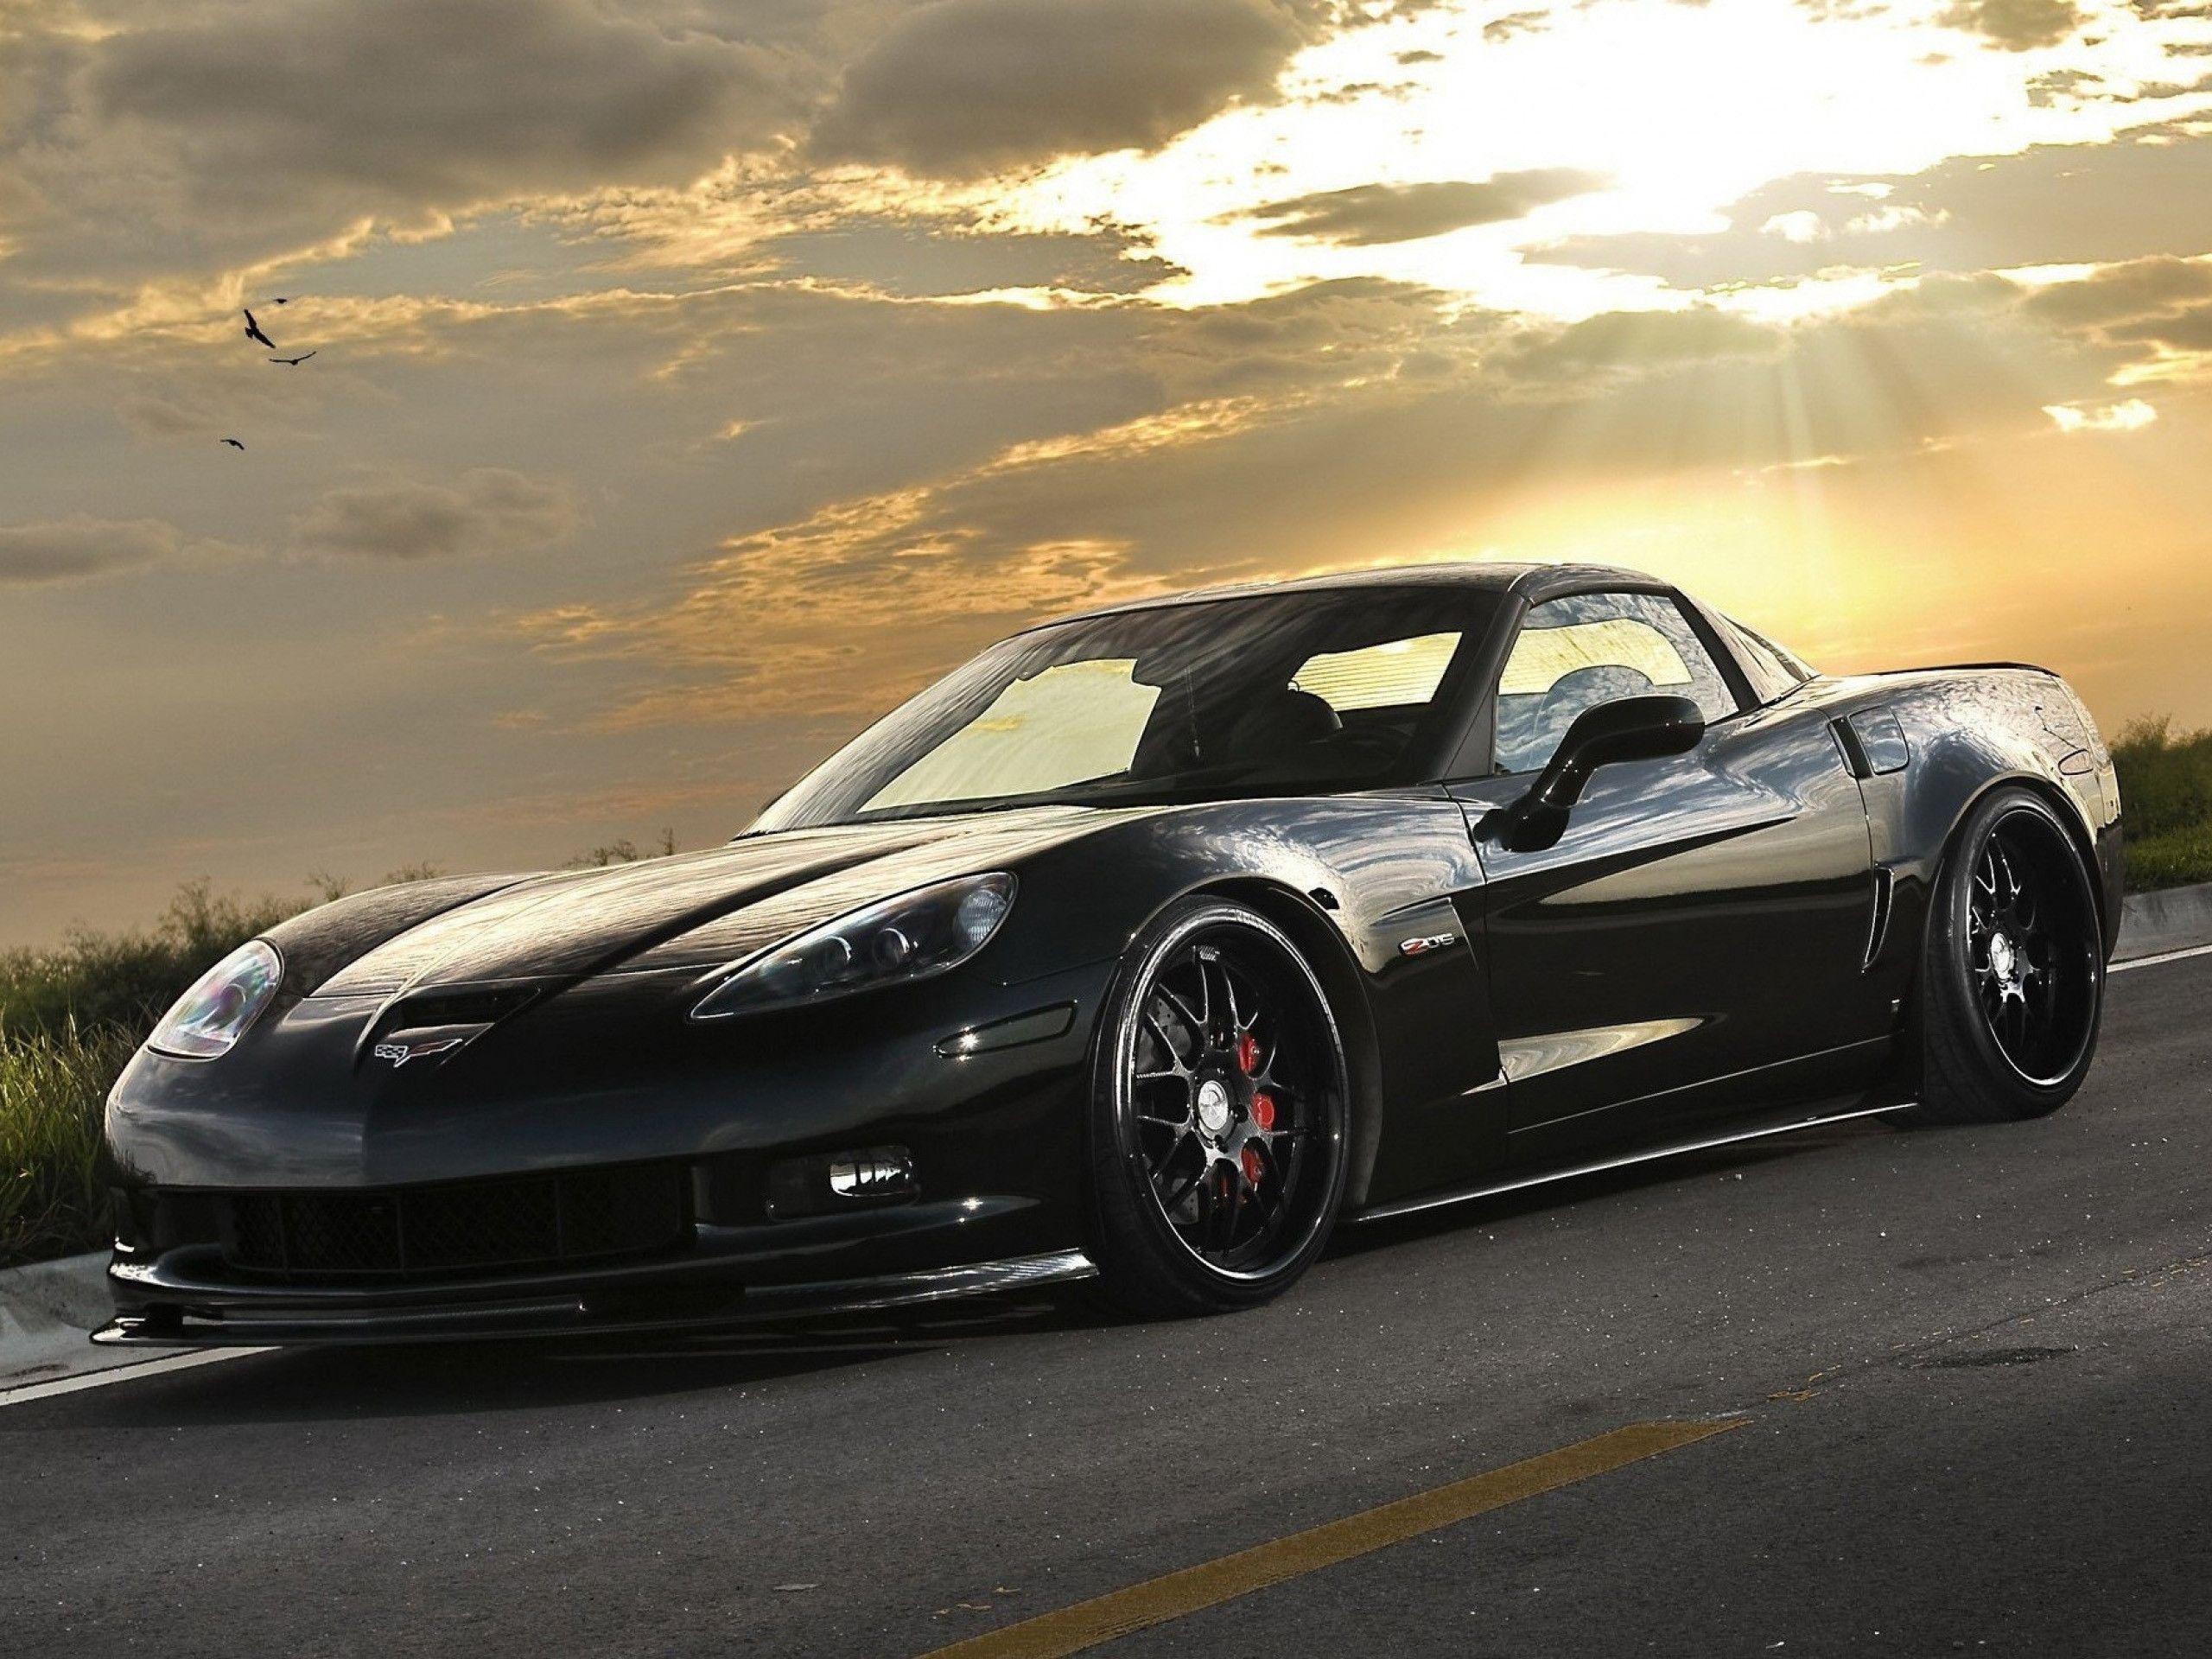 black corvette zr1 wallpapers - photo #11